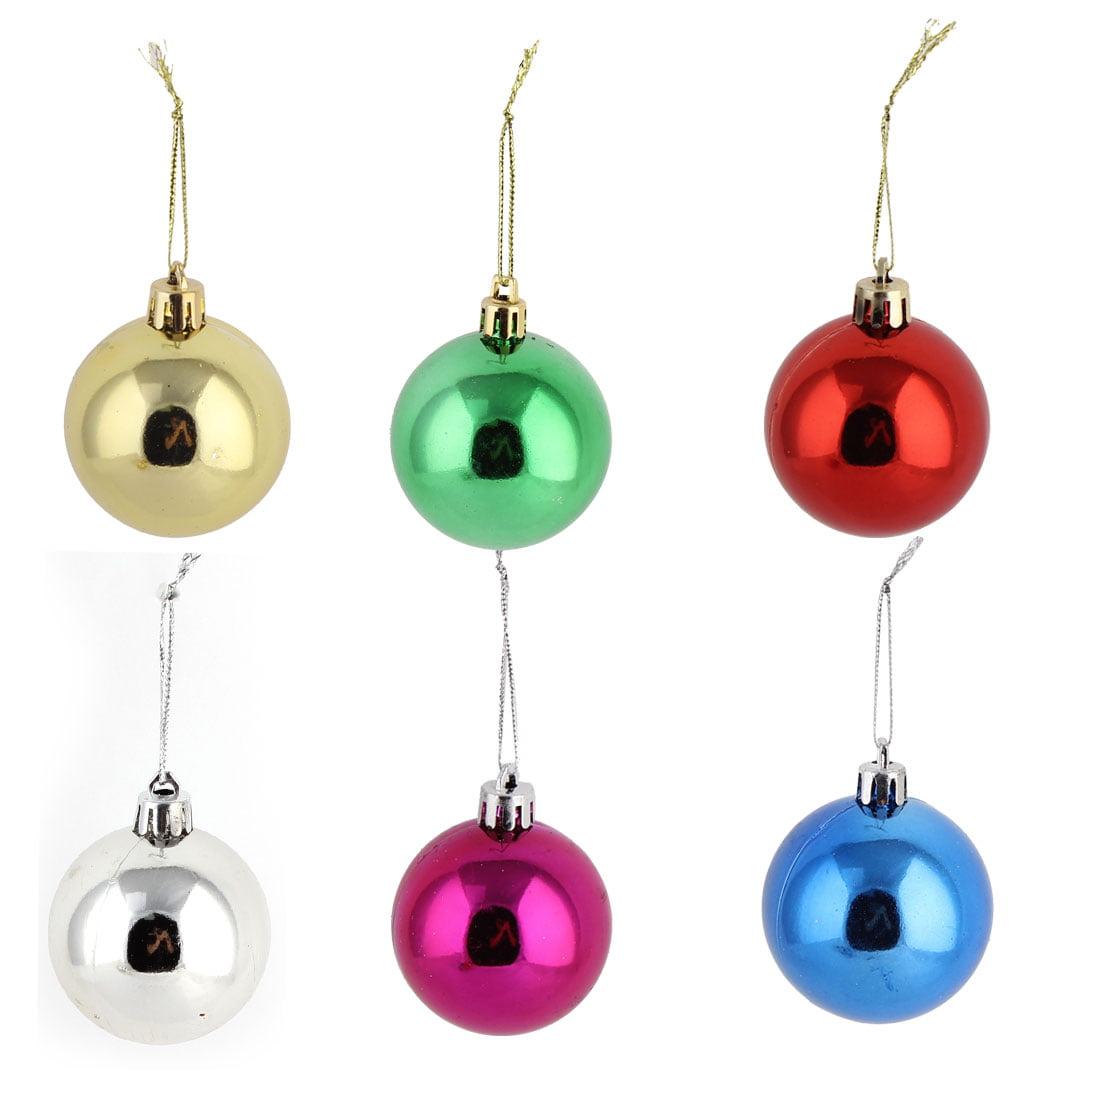 Unique Bargains Household Christmas Tree Plastic Artificial Adornments Ball 6 Pcs